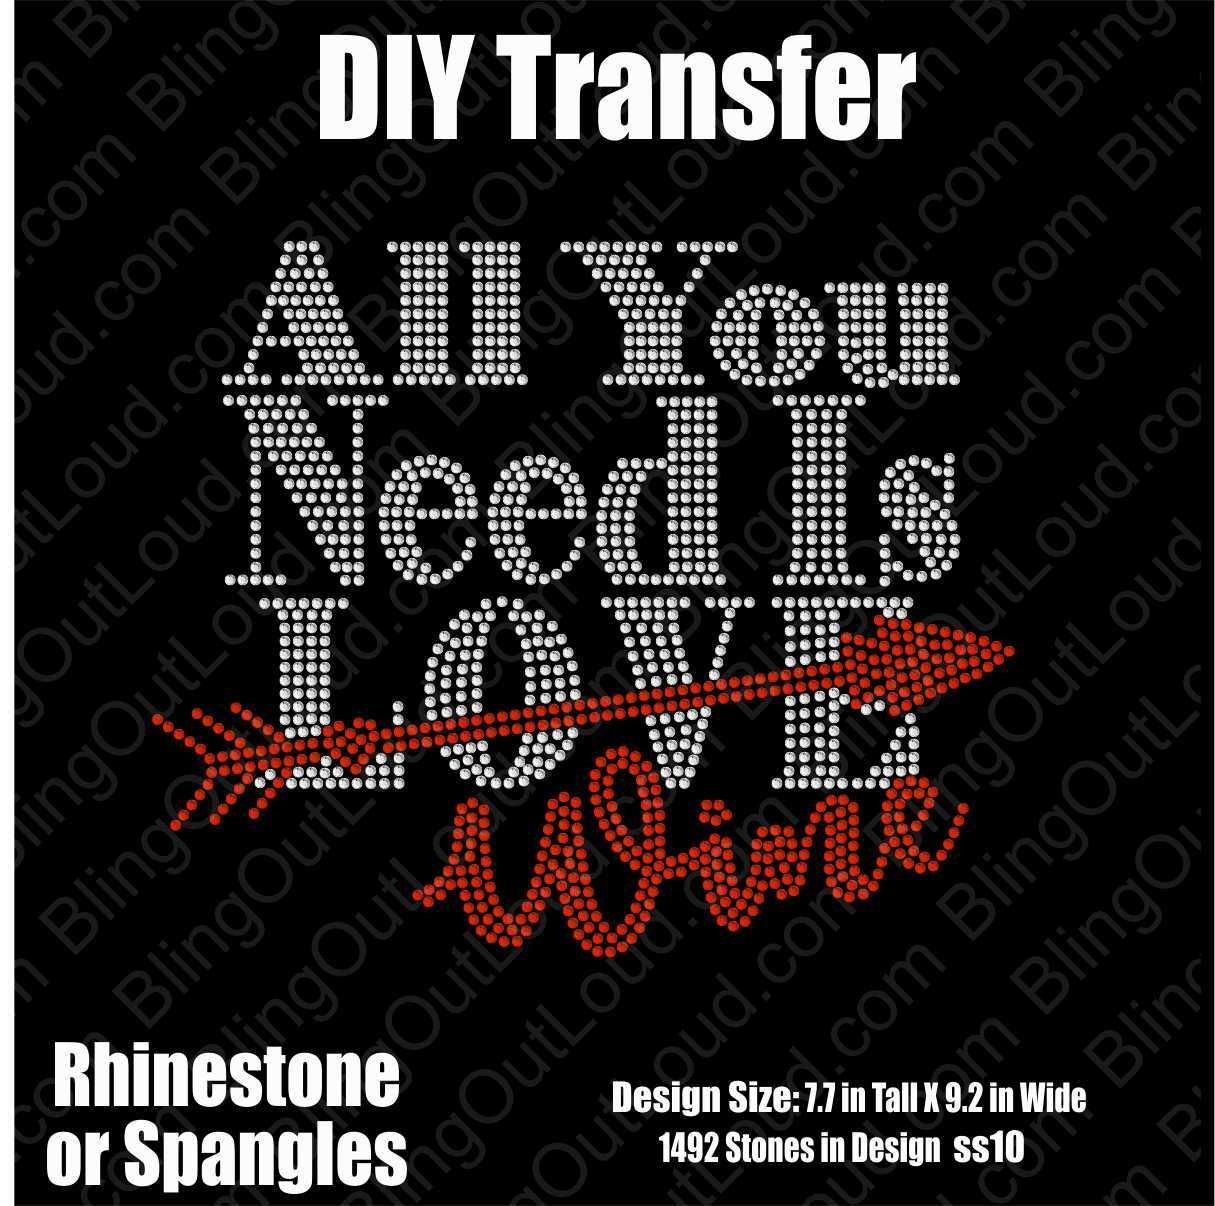 All You Need Is Love/Wine DIY Rhinestone Transfer AllYouNeedIsLove_DIY